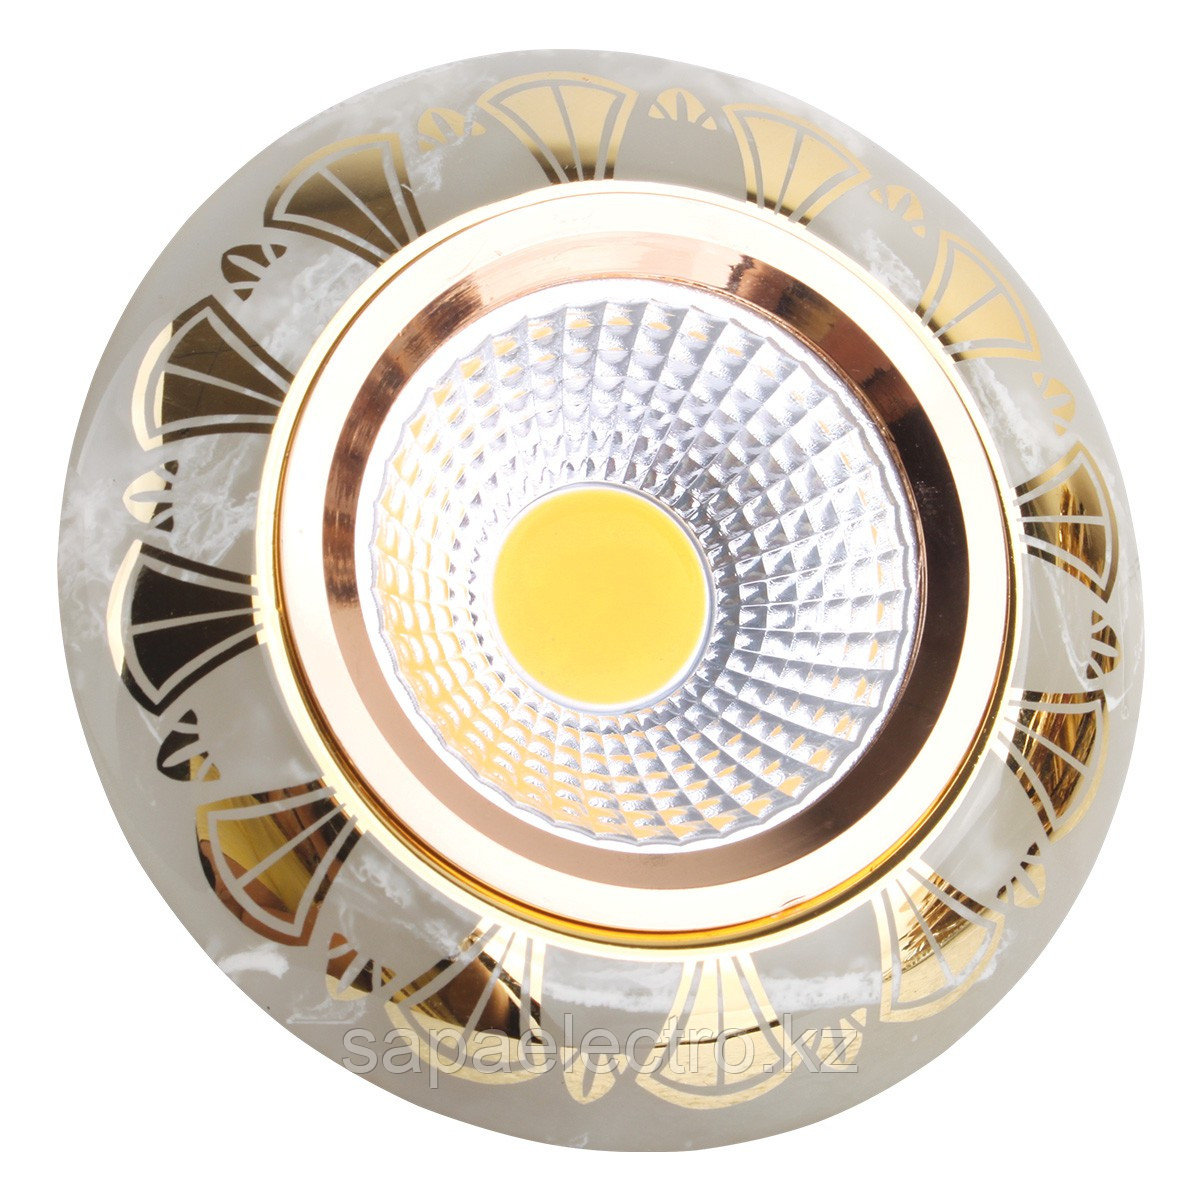 Спот MR16 YS7003 MARBLE+ GOLD  GU5.3 (TEKSAN) 100шт